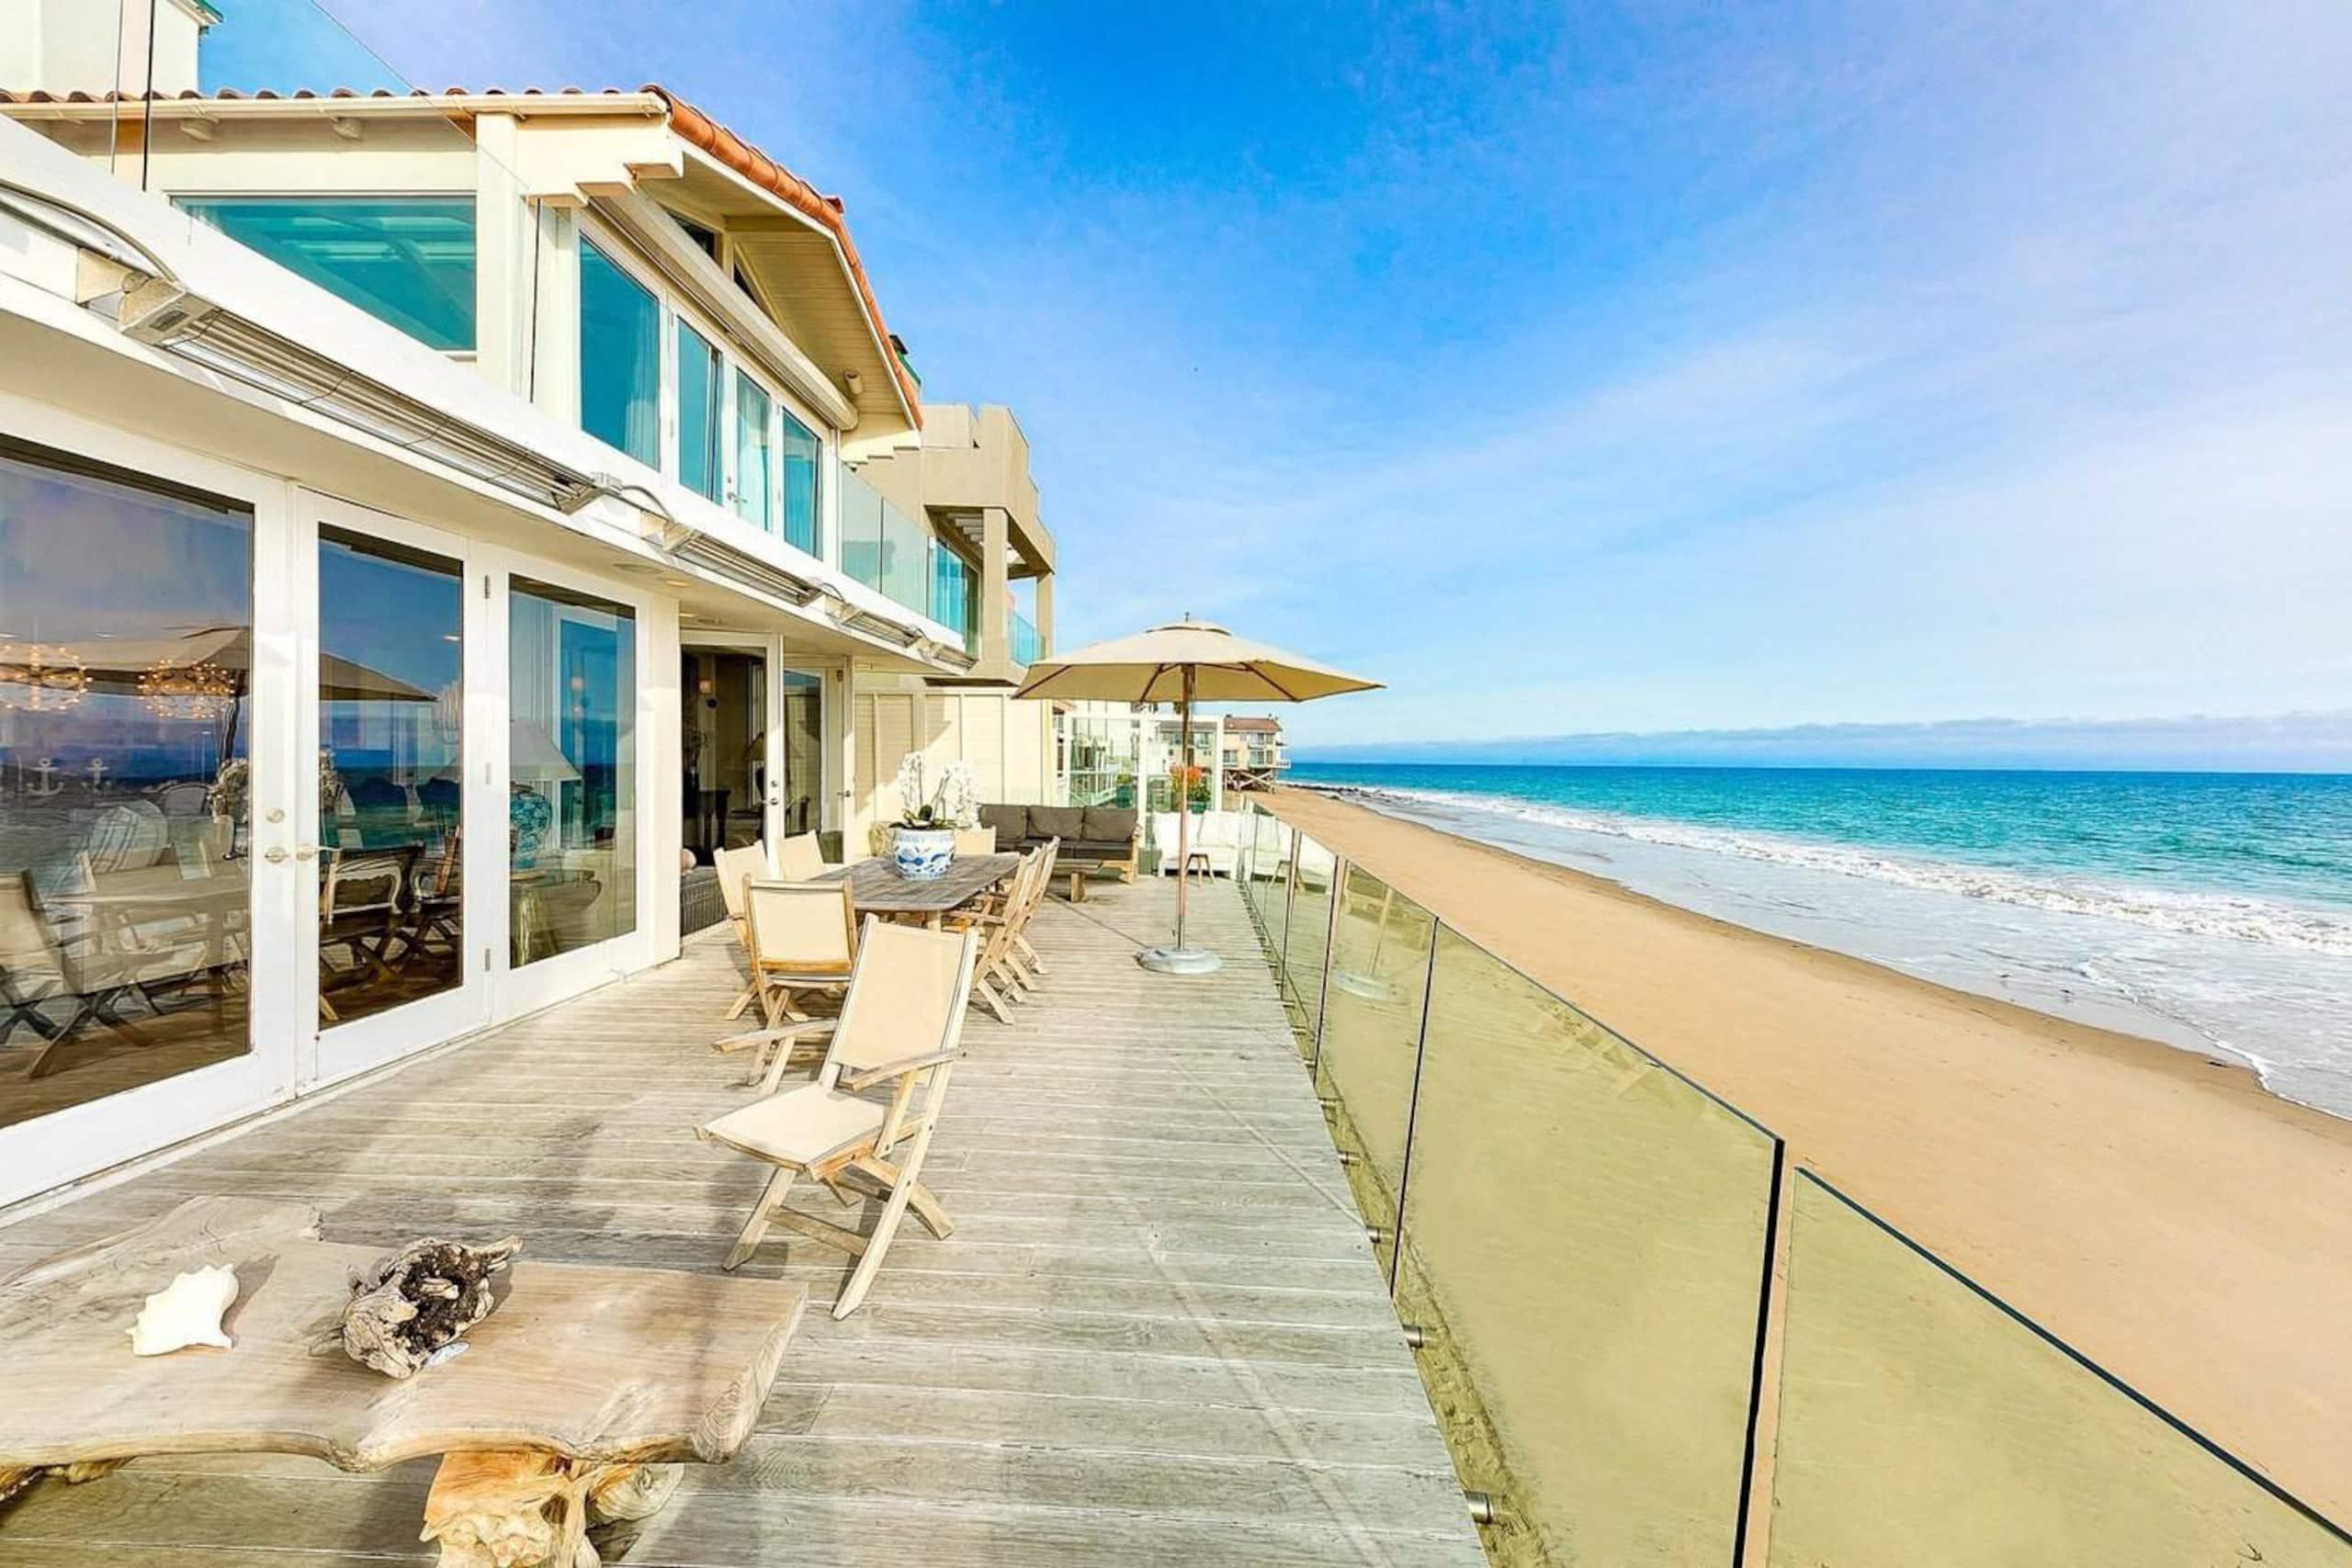 Apartment Villa Shawaiz - Beachfront Villa with 5 beds  photo 20254122